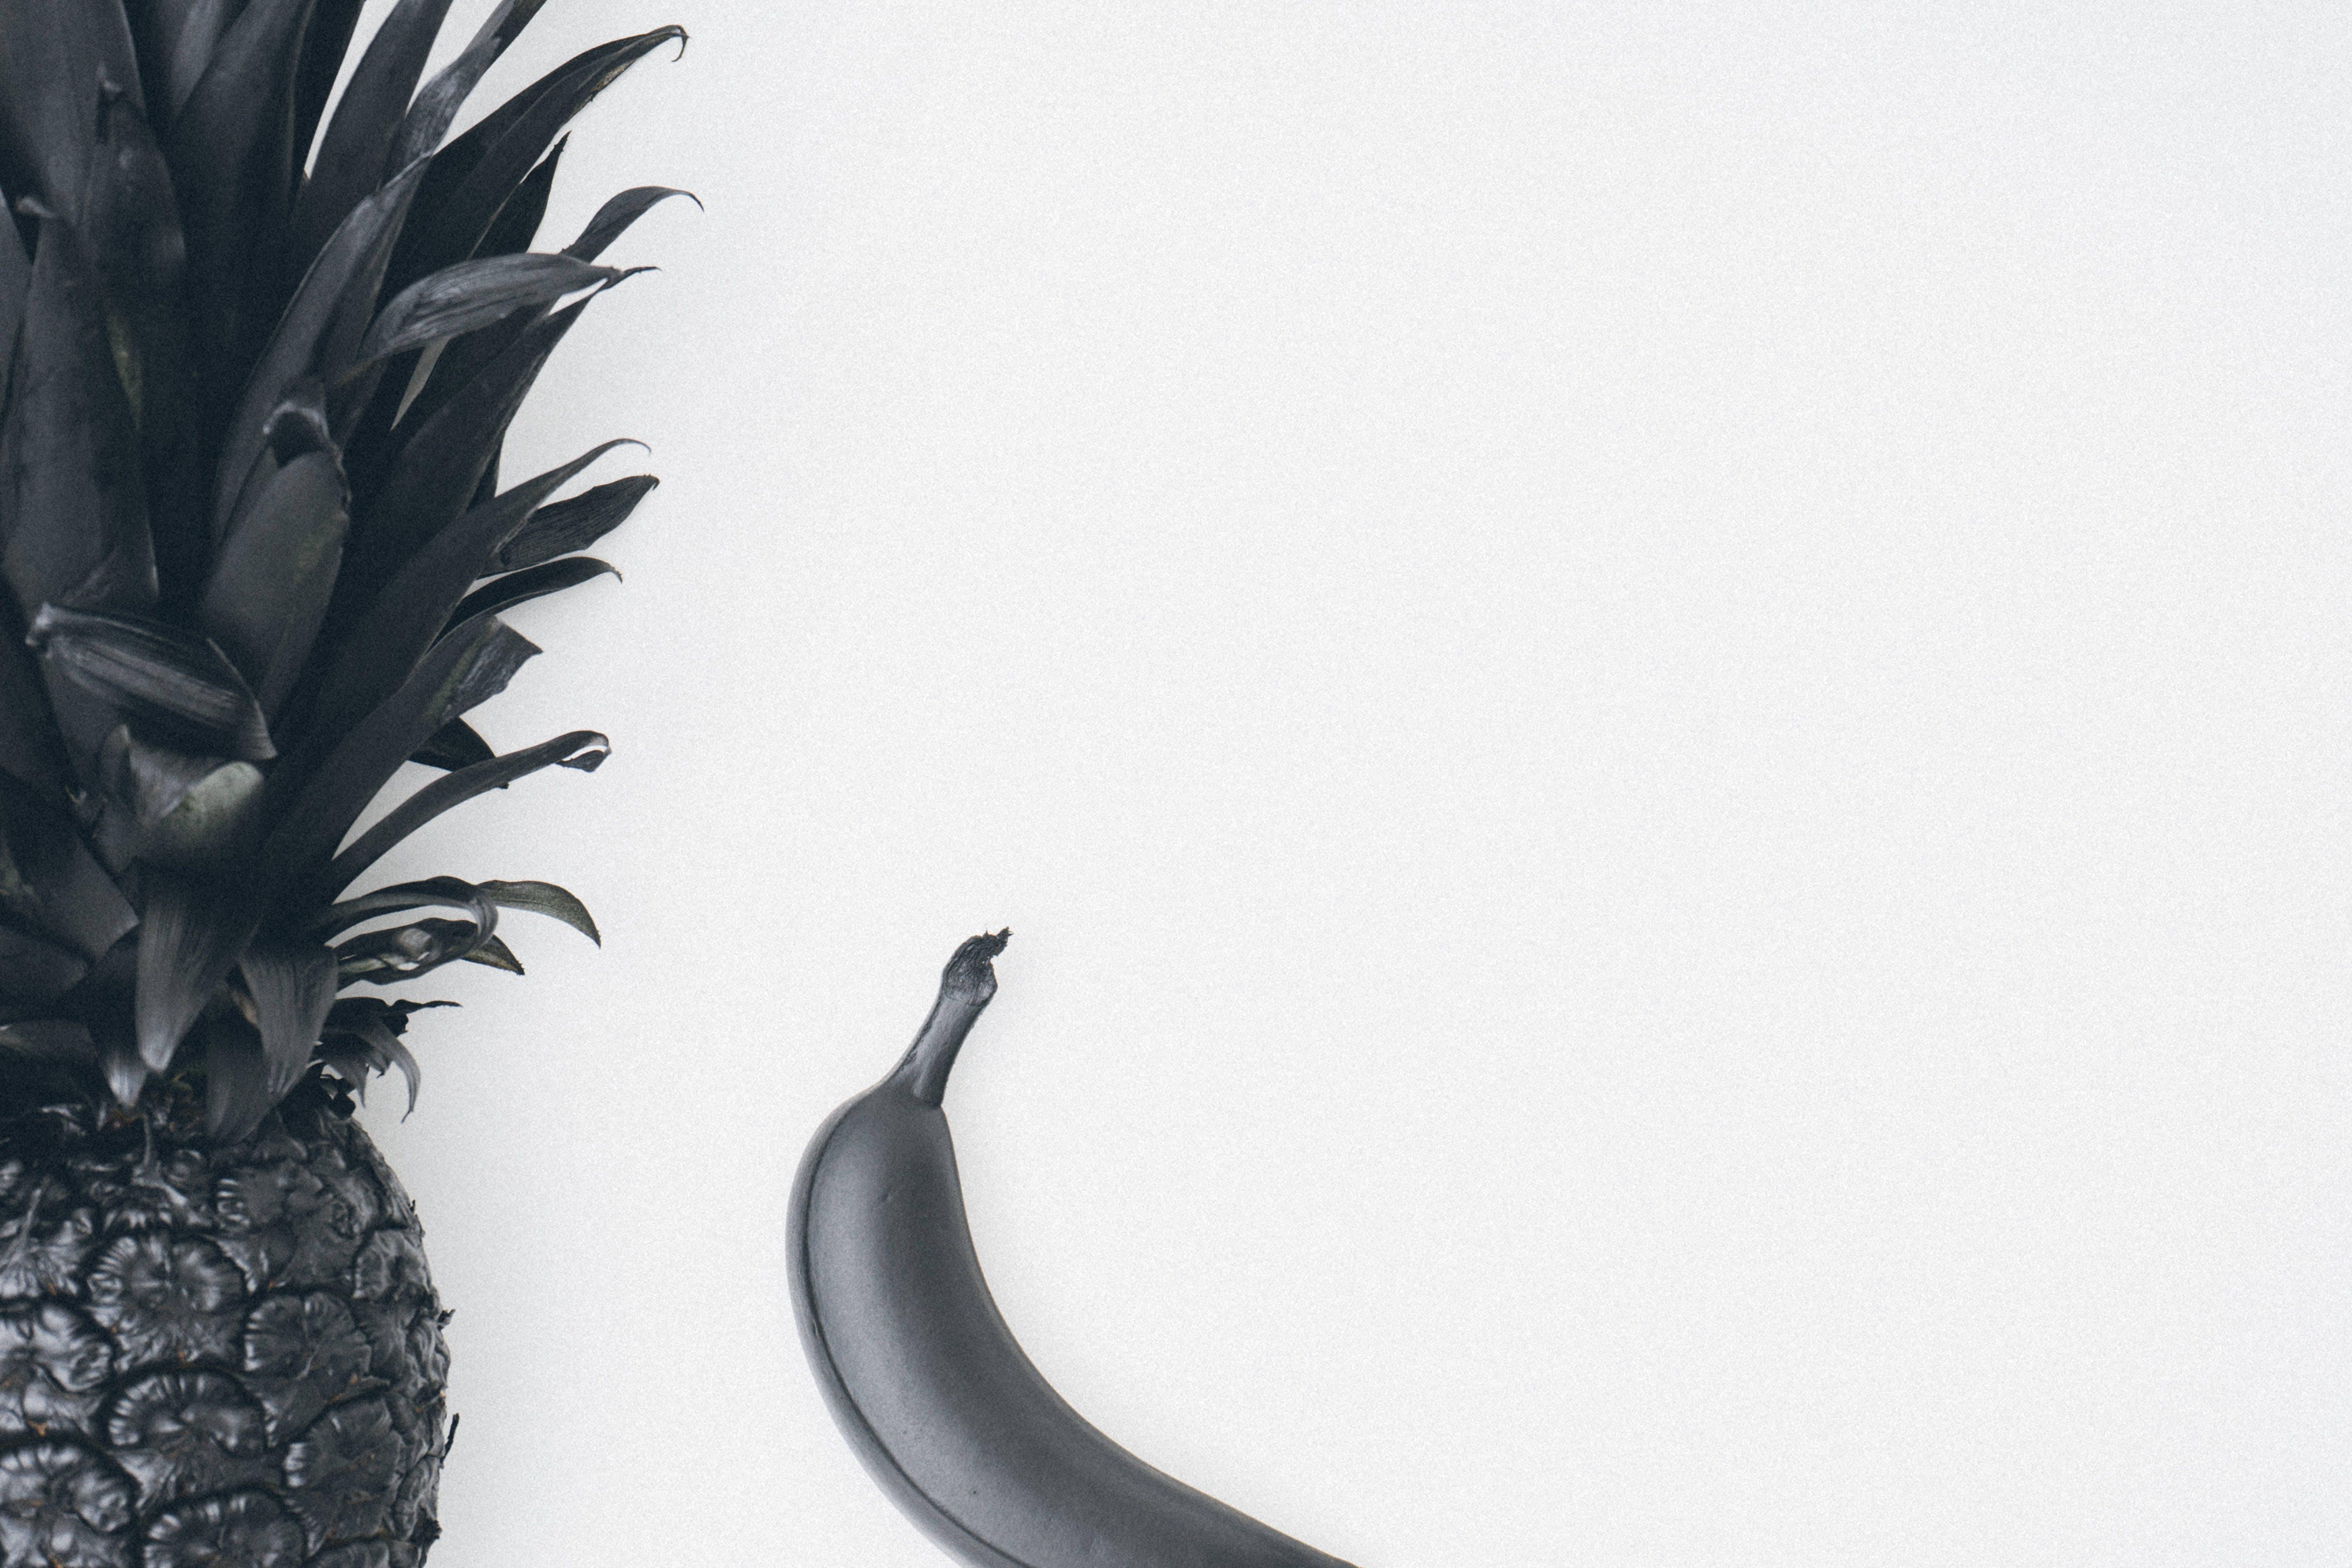 Free stock photo of art, pineapple, black, banana